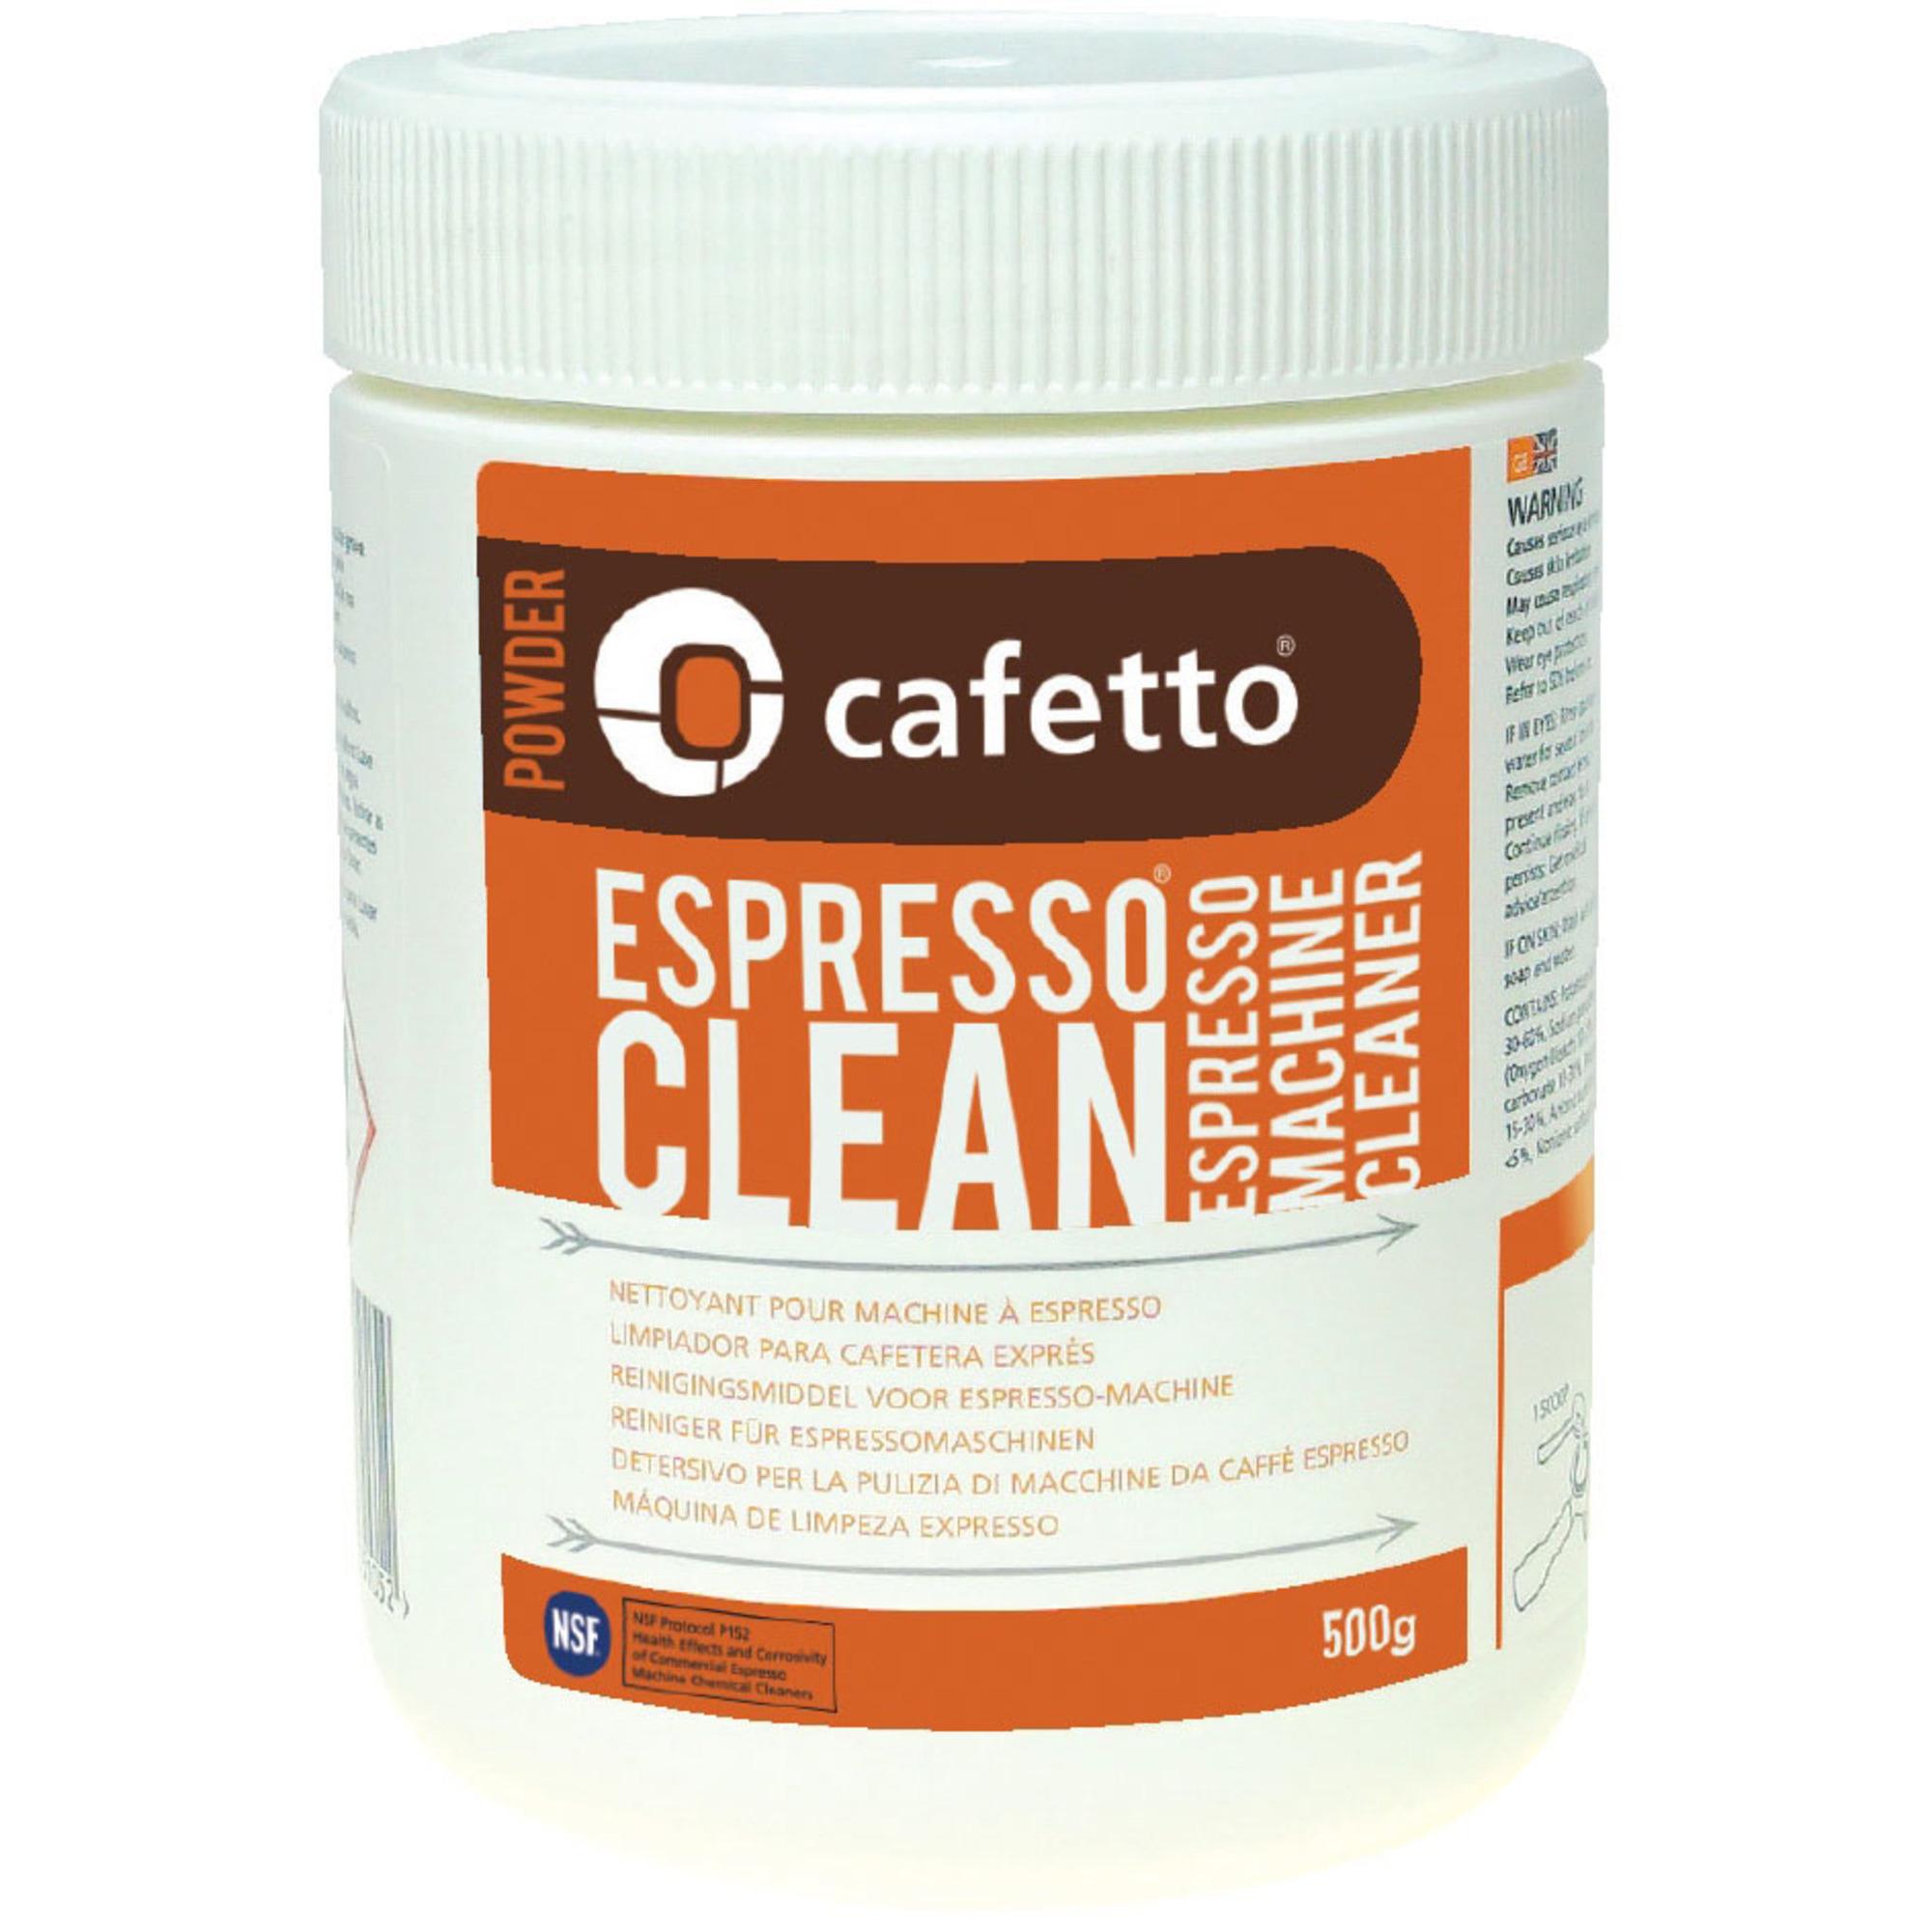 Cafetto Rengöringspulver 500 g.